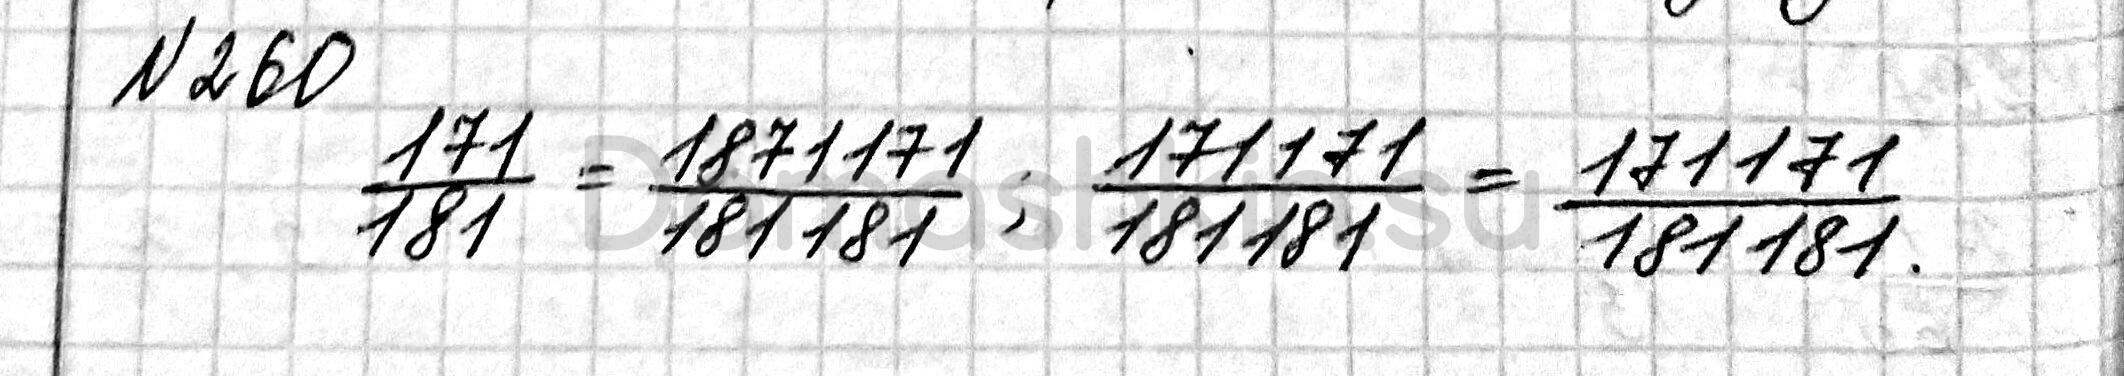 Математика 6 класс учебник Мерзляк номер 260 решение